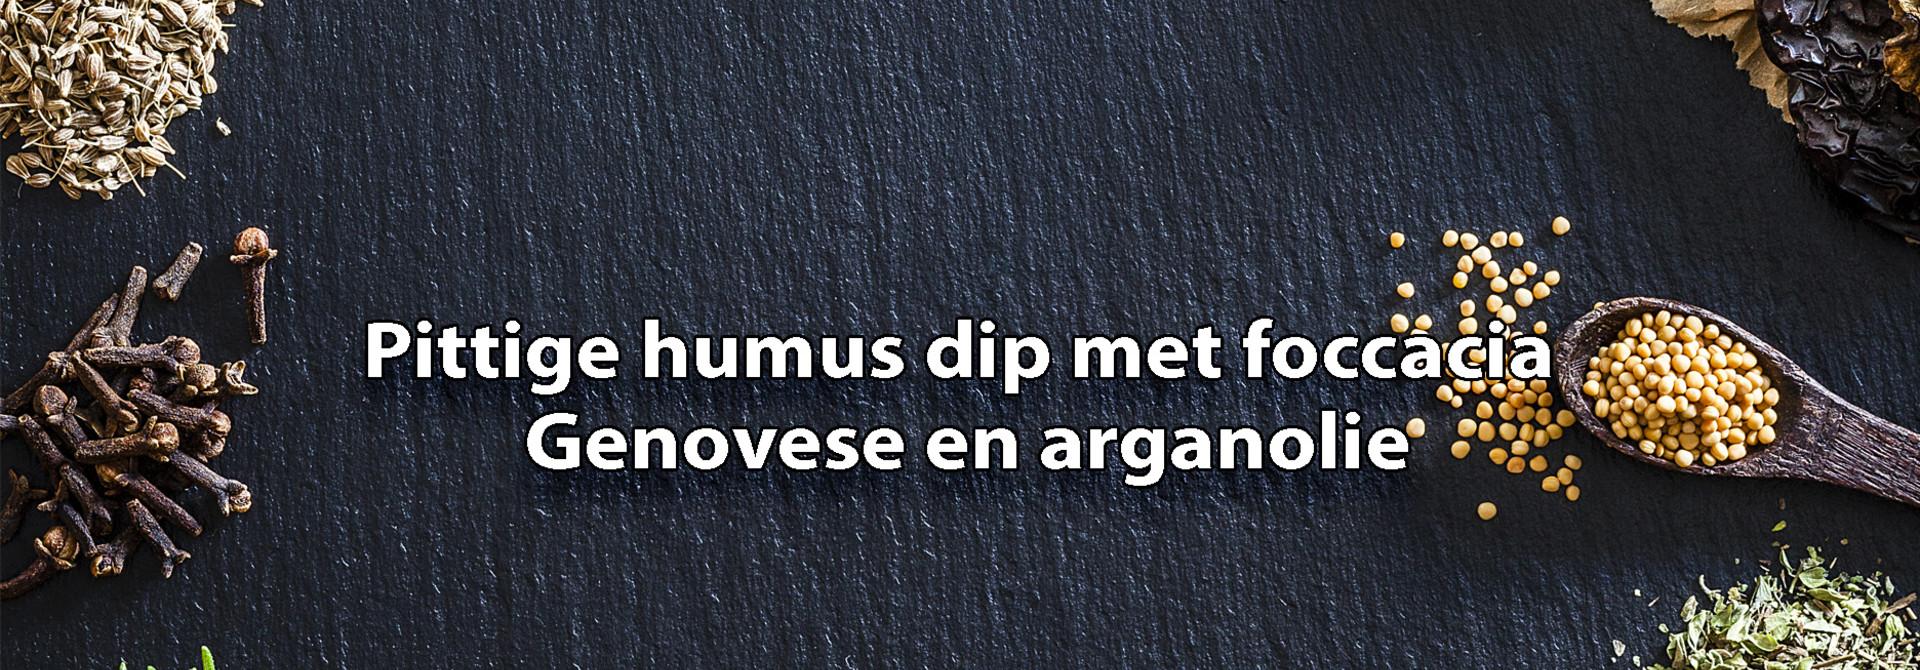 Pittige hummus dip met foccacia en arganolie